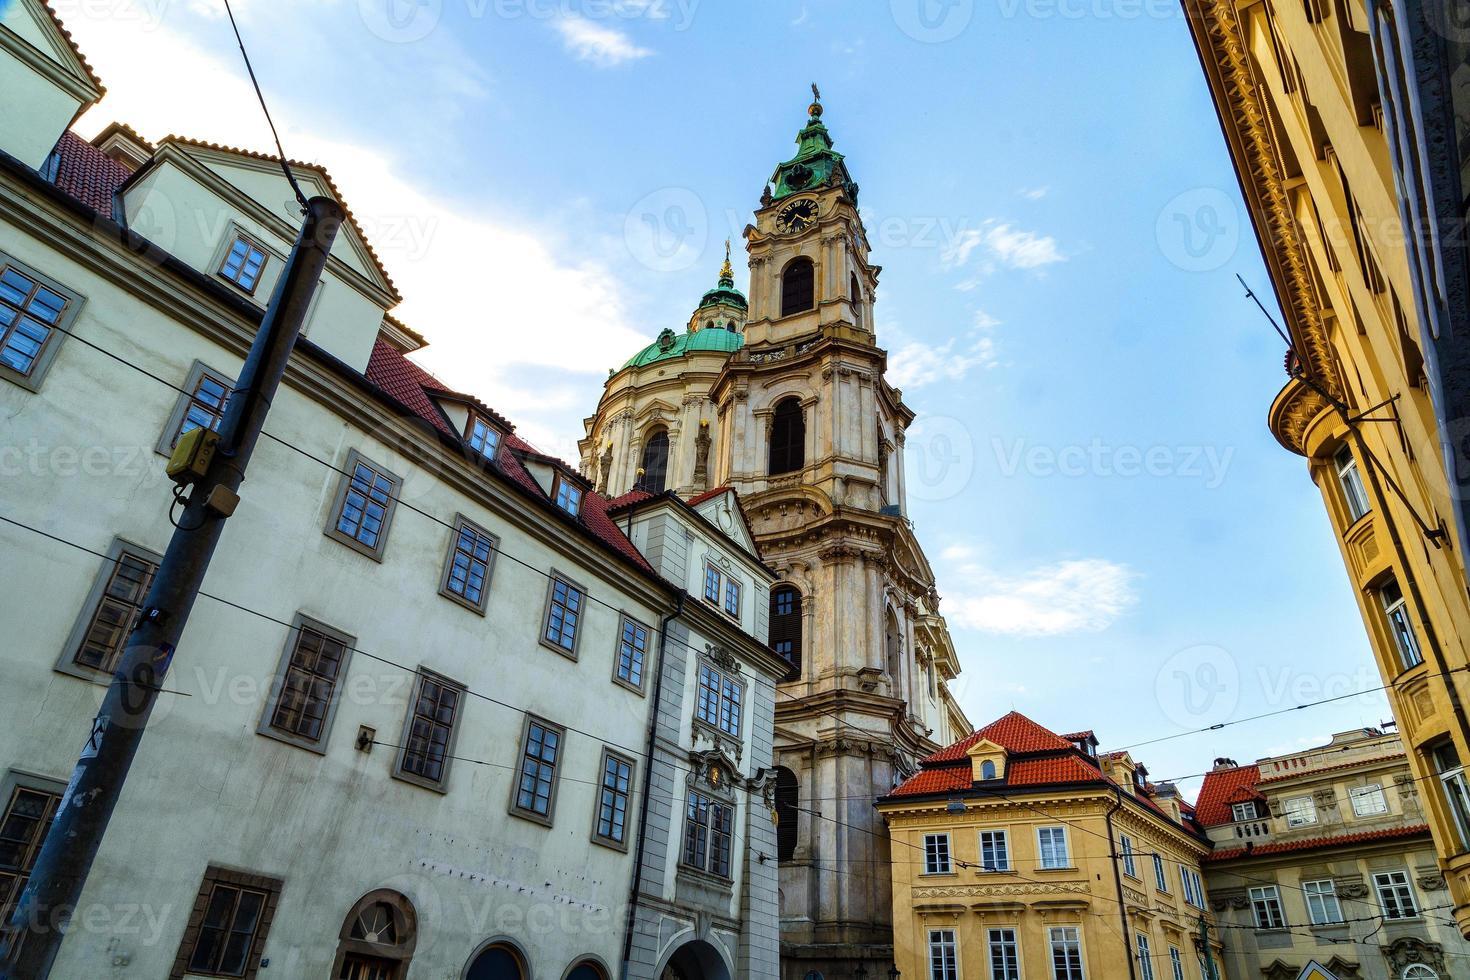 st.nicholas Kirche in Mala Strana foto